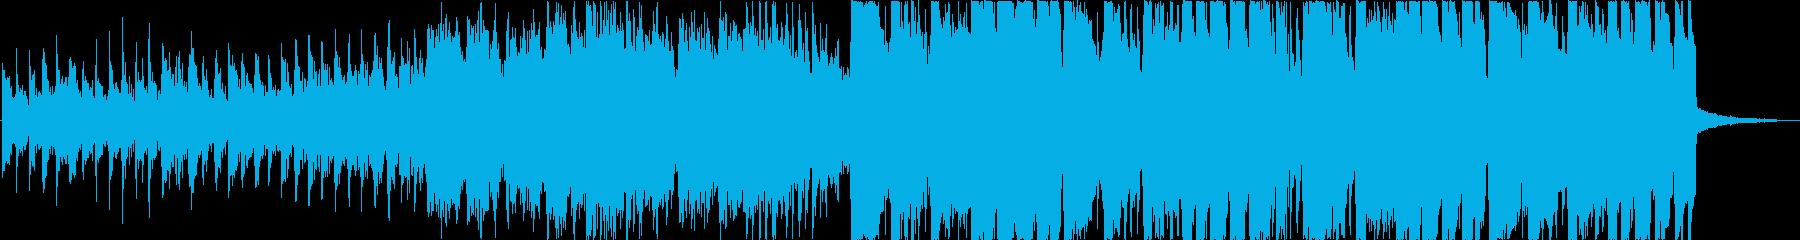 Kawaii FutubassなBGMの再生済みの波形